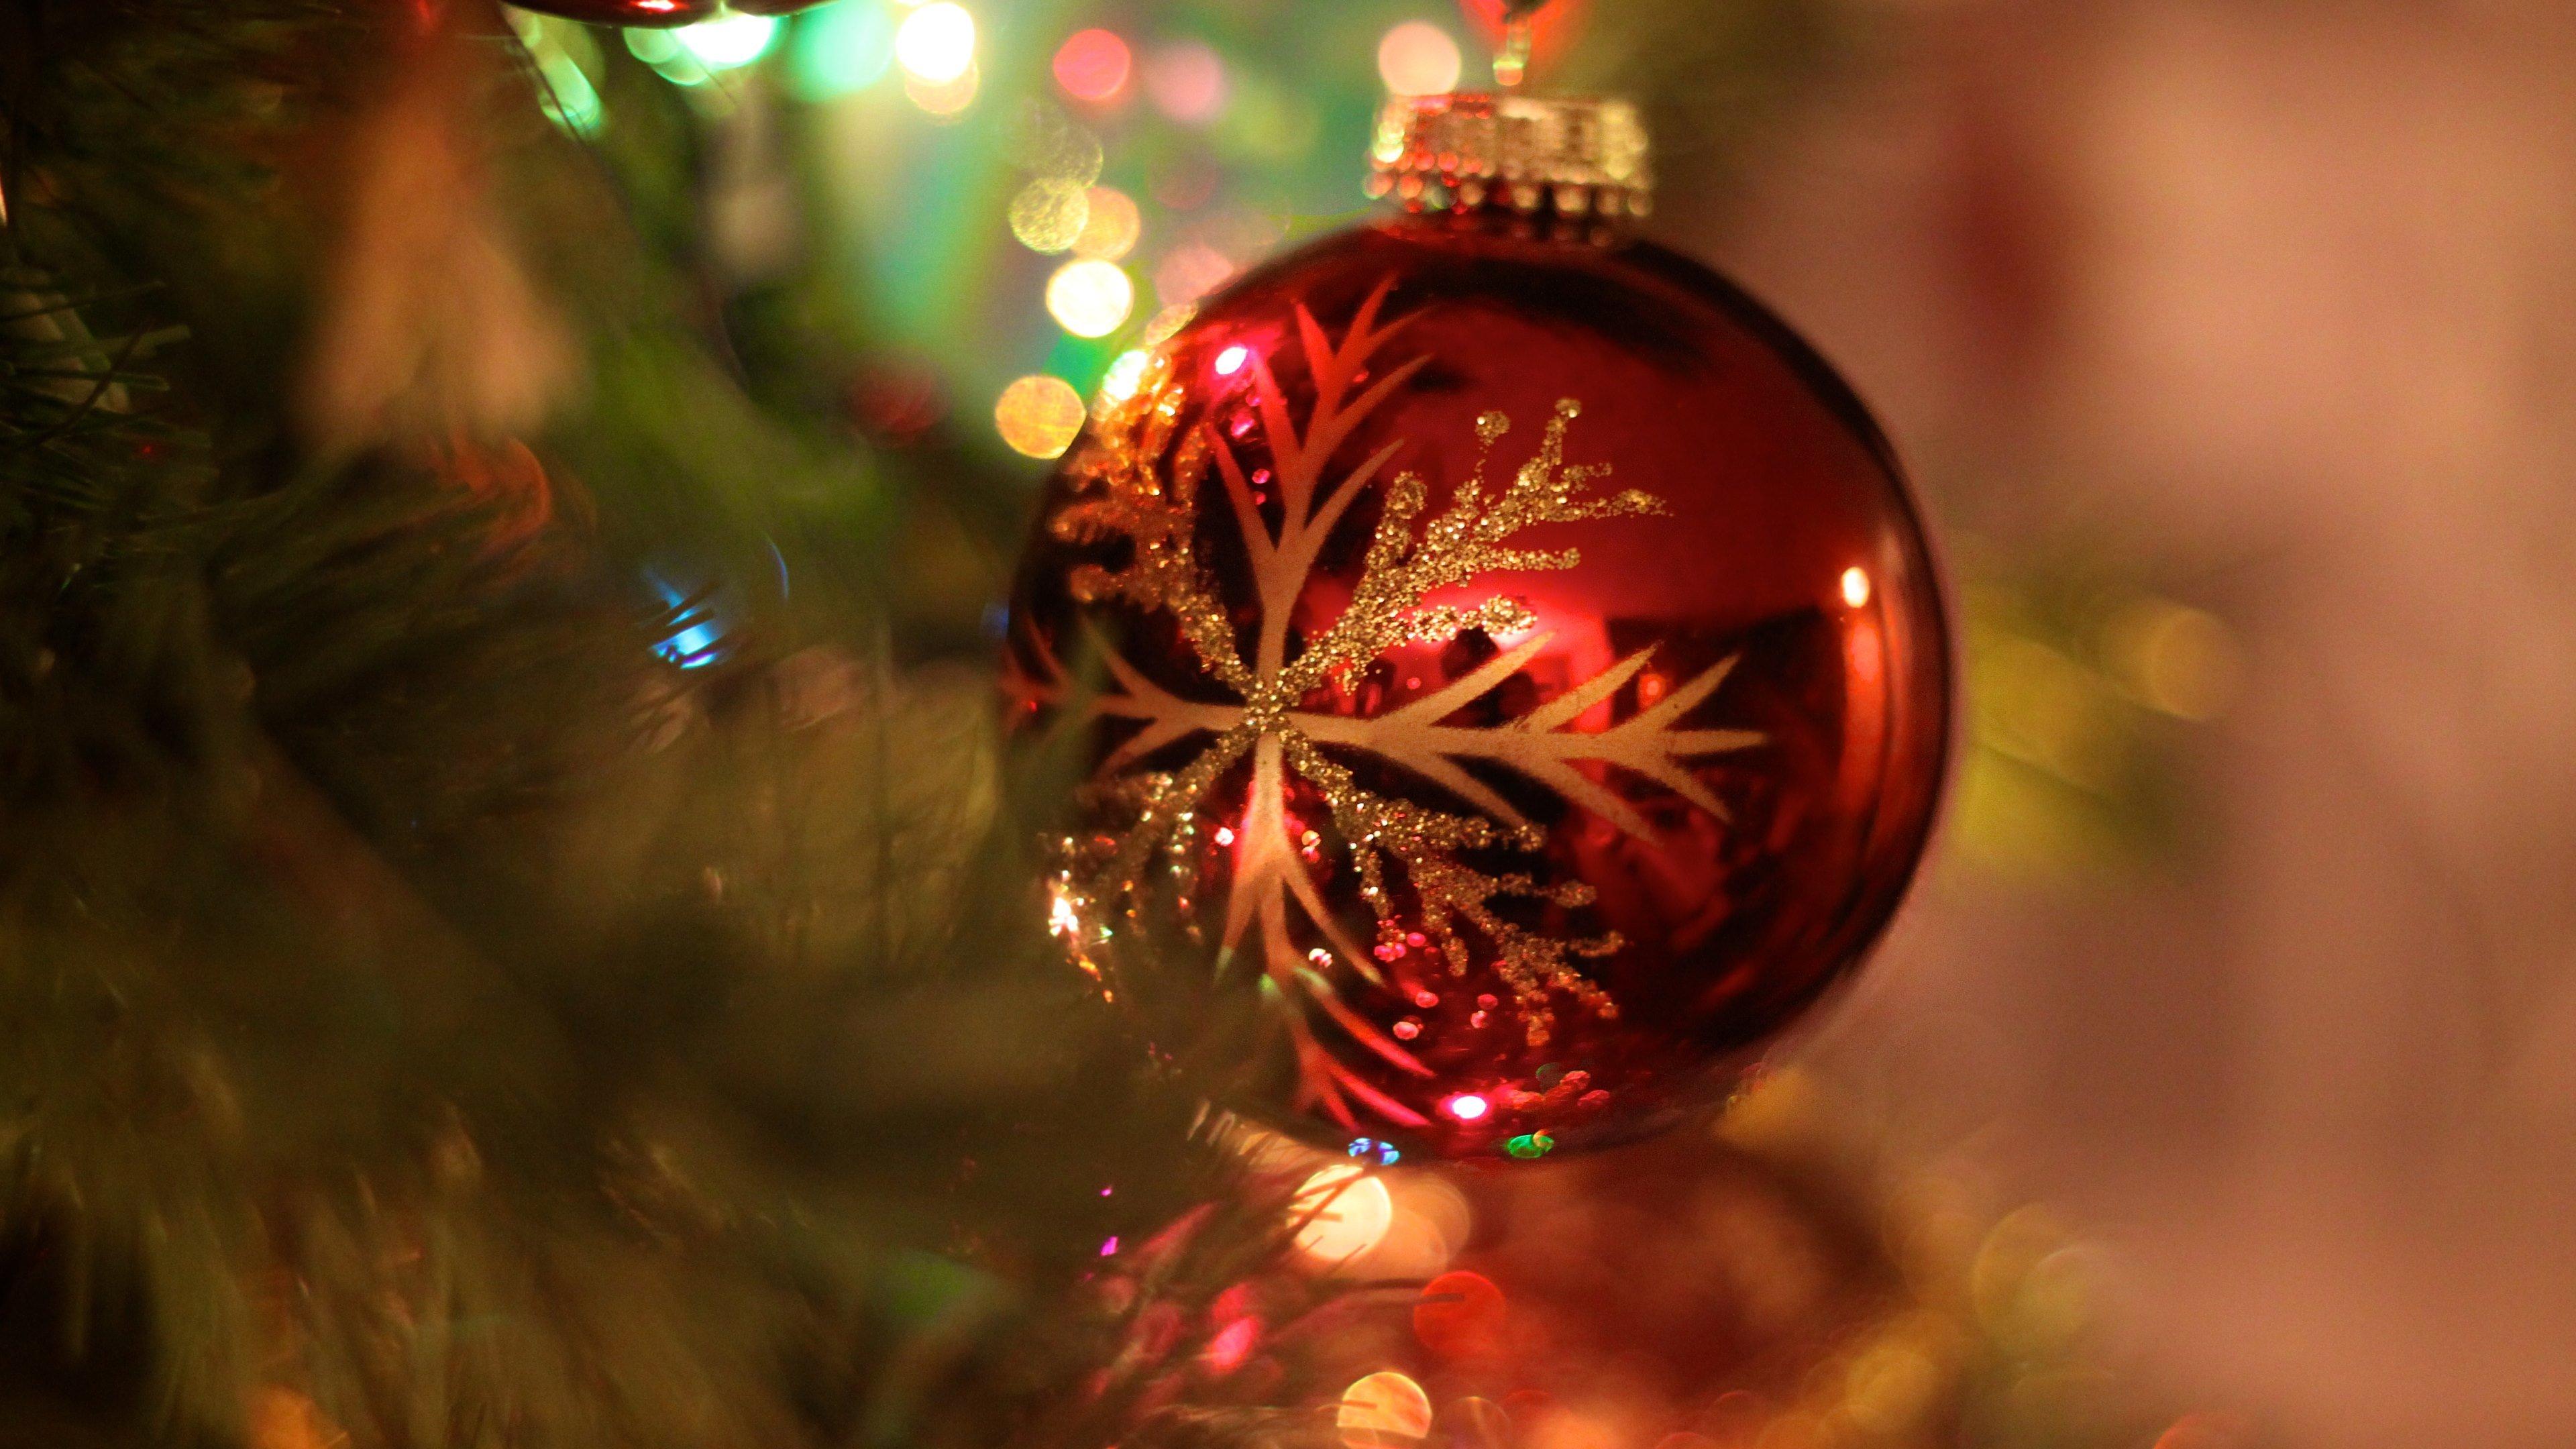 Download 4k Christmas Ornaments Decorations Desktop Wallpaper Id434994 For Free